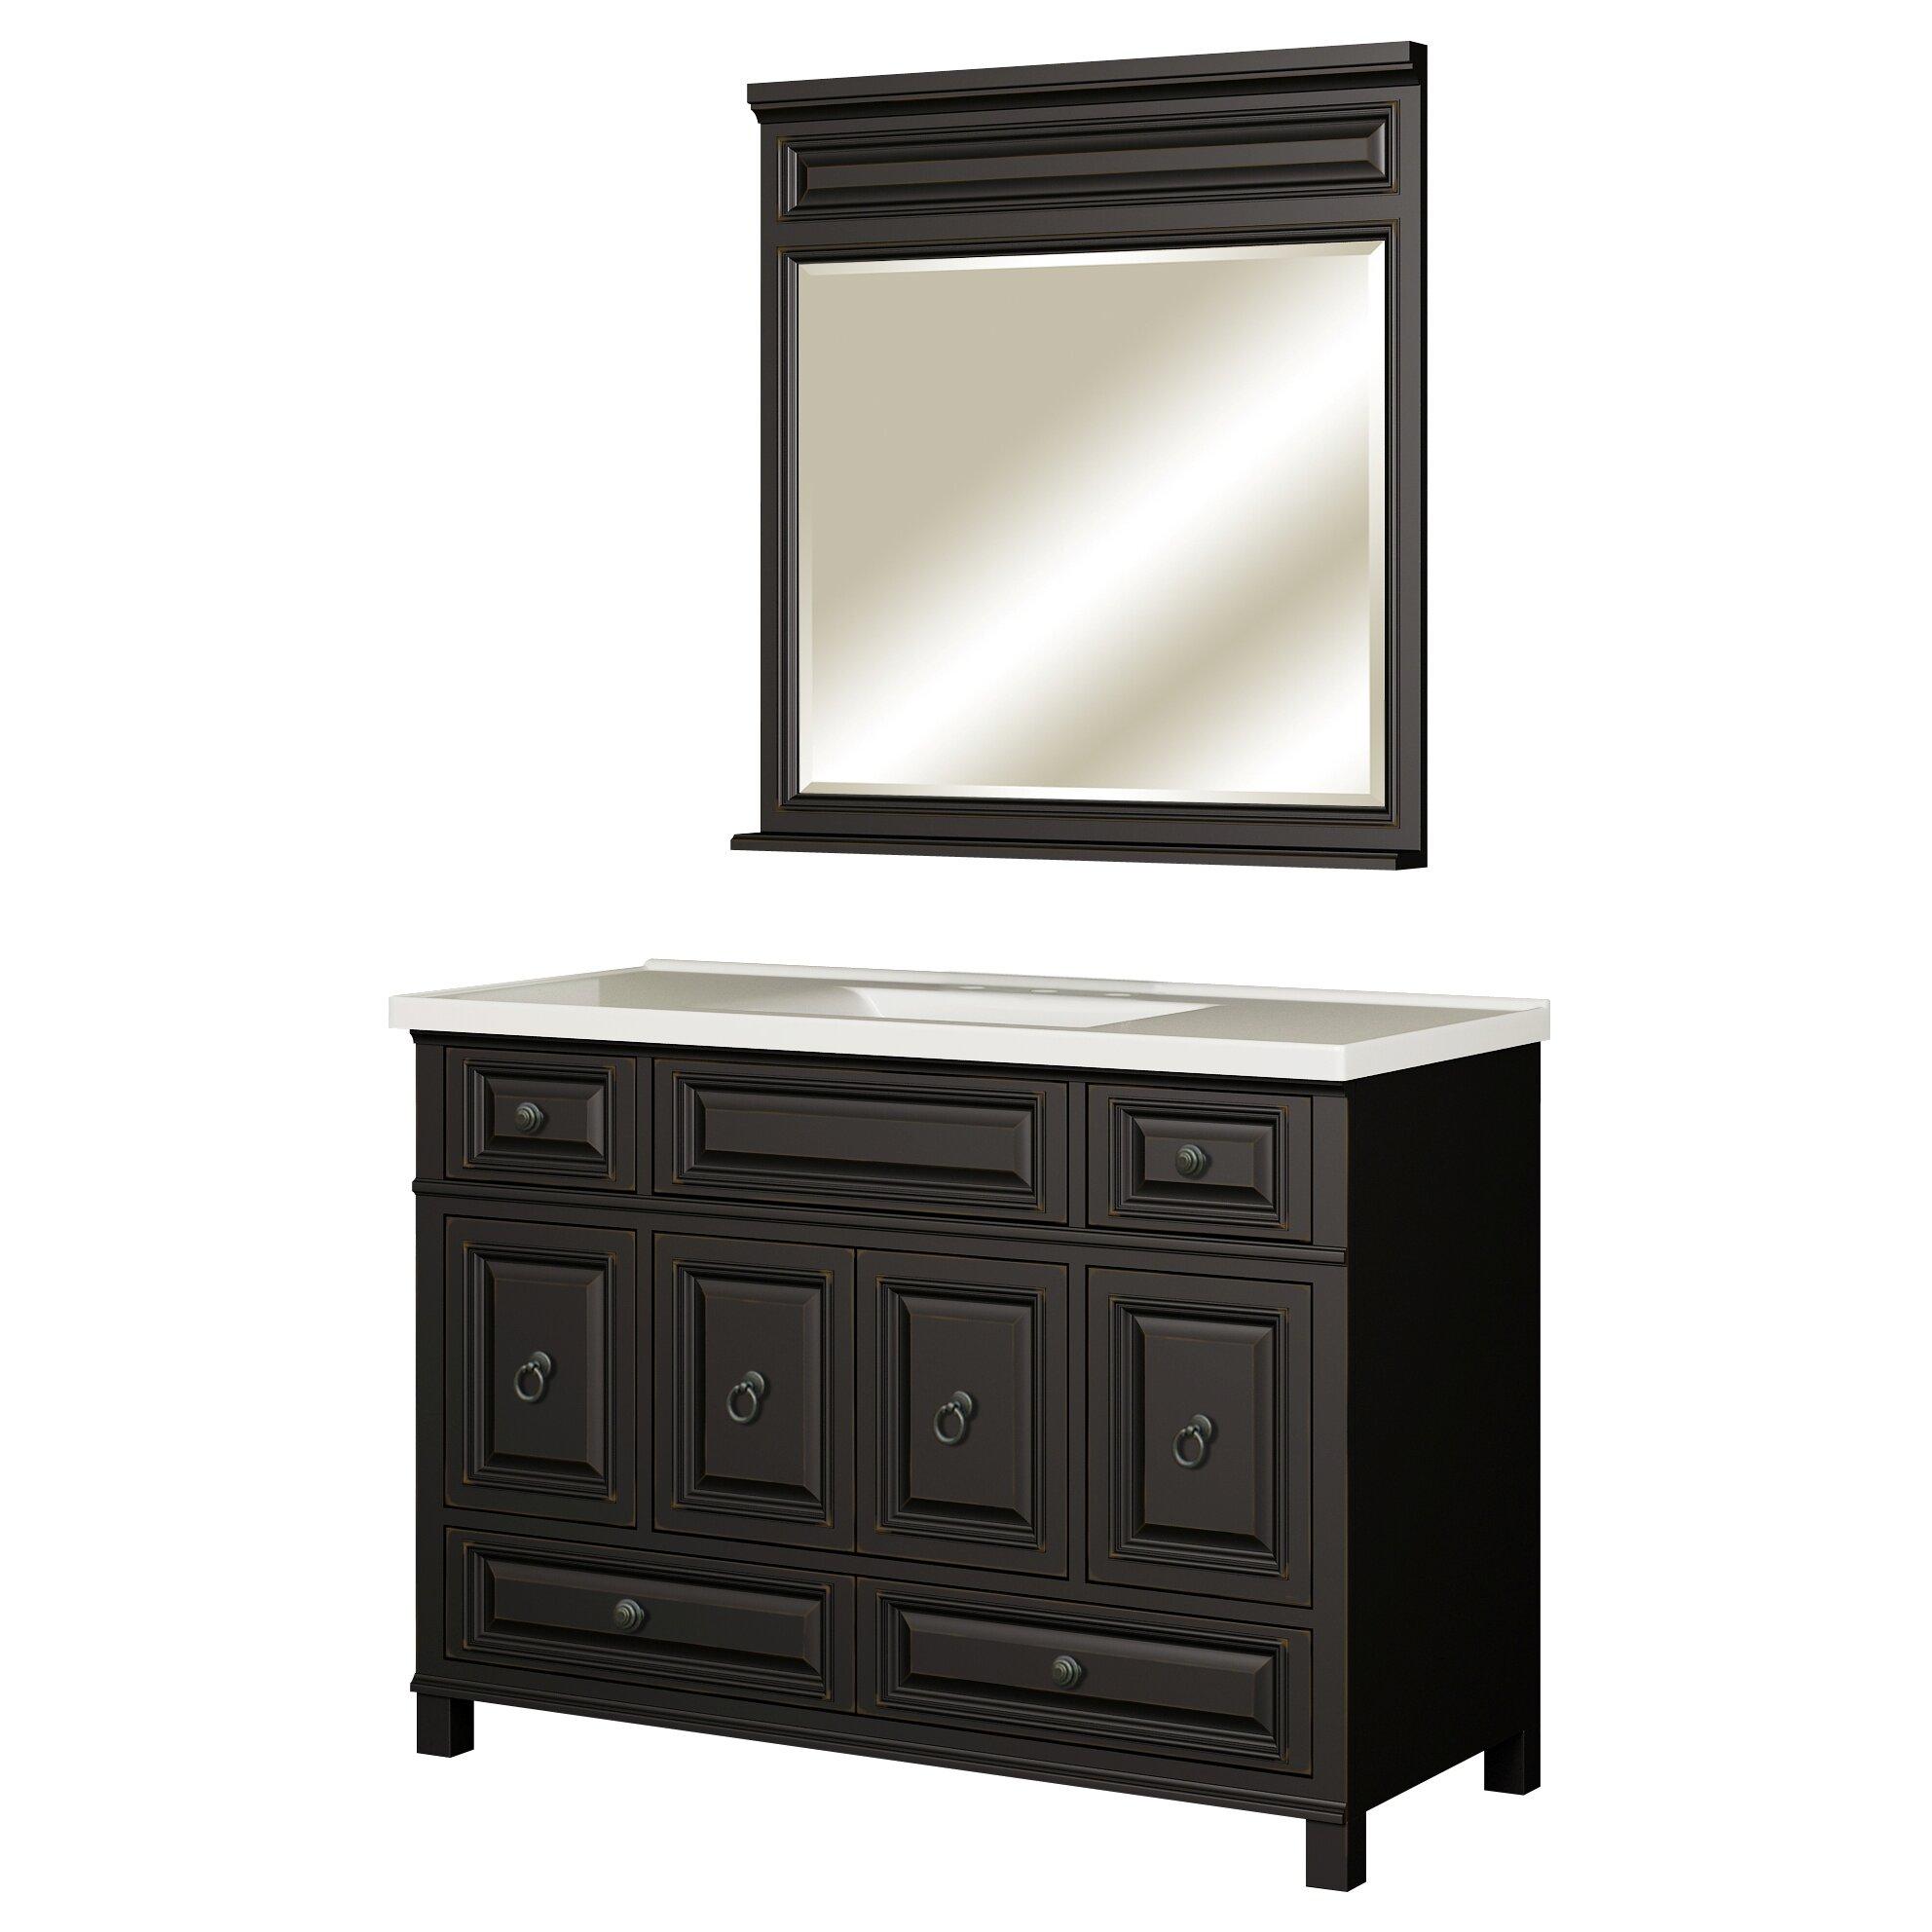 Sagehill premier 49 single bathroom vanity top reviews for Sagehill designs bathroom vanity